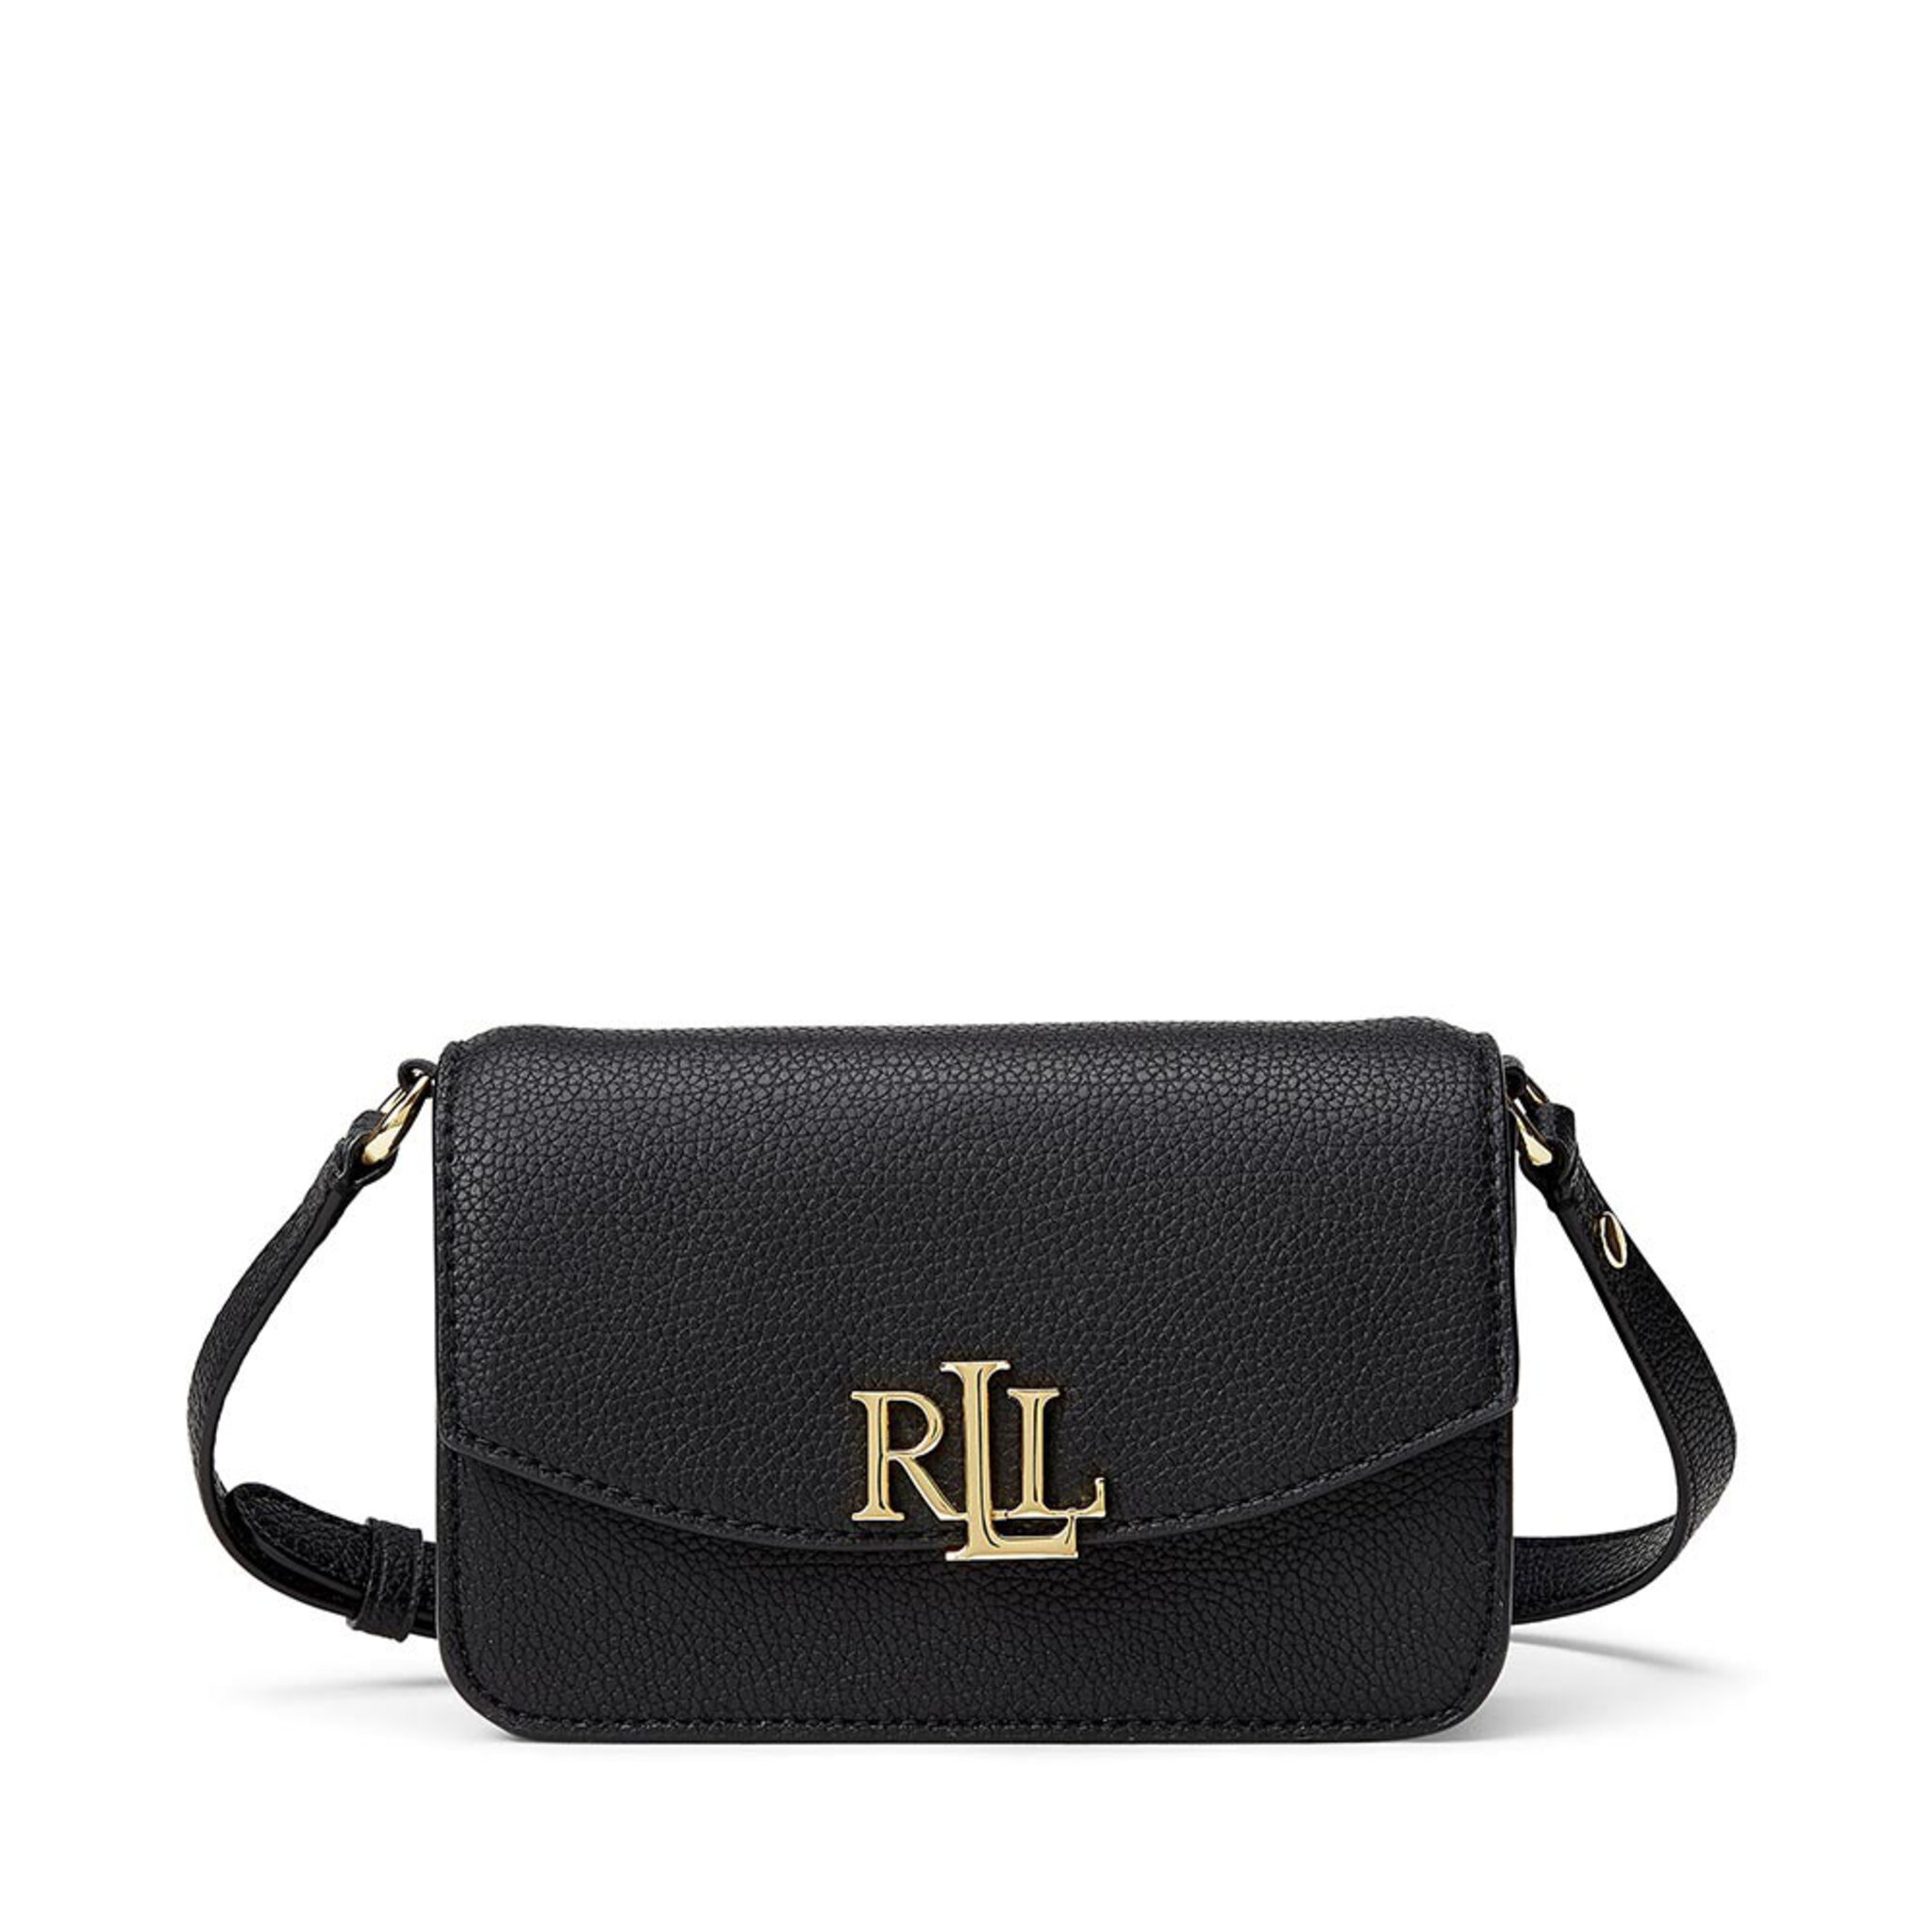 Leather Crossbody Bag, OSZ